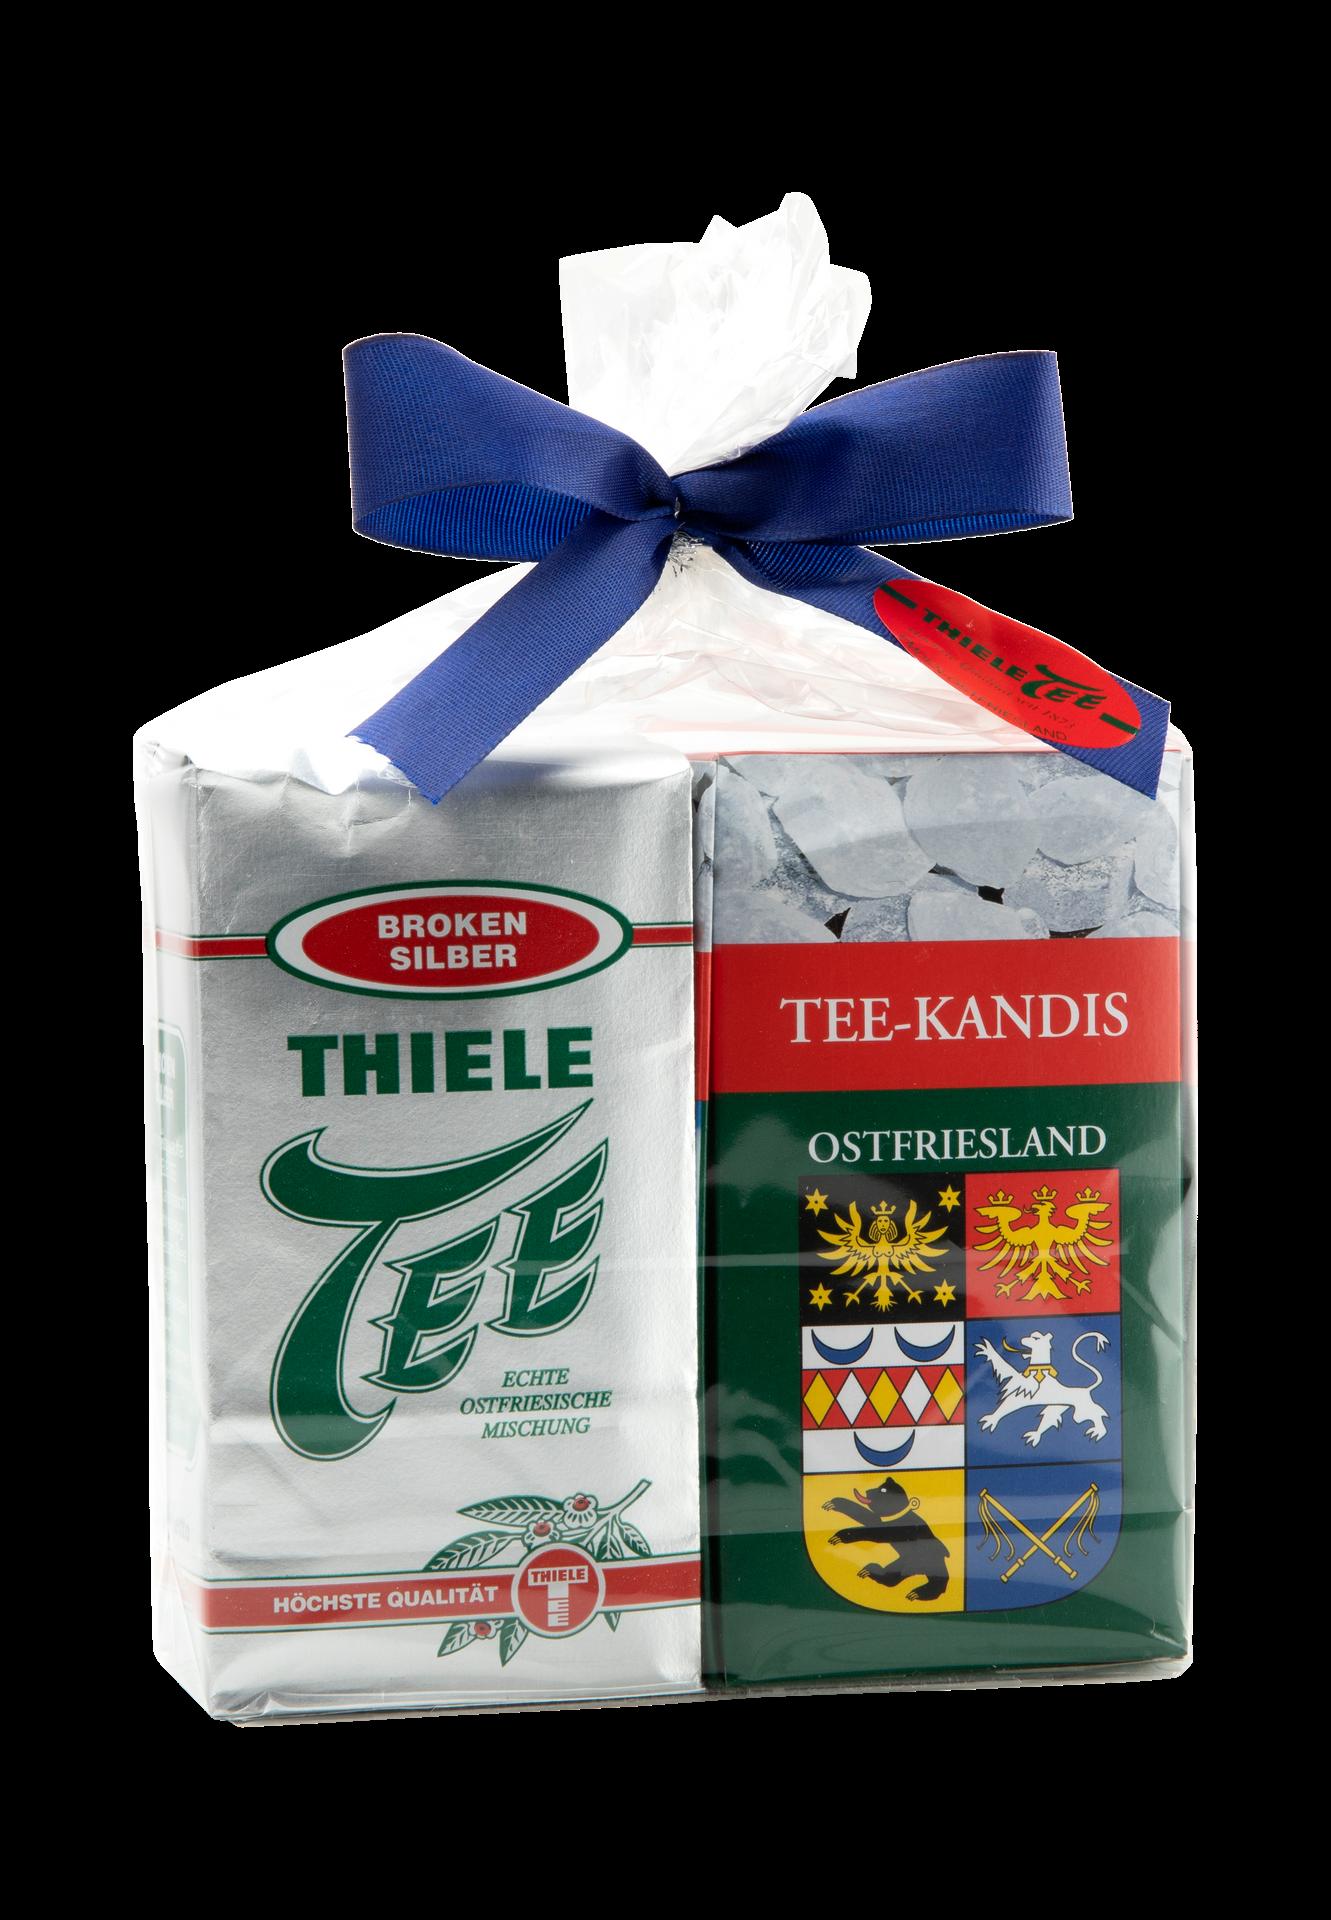 Tee & Kandis Ostfriesland